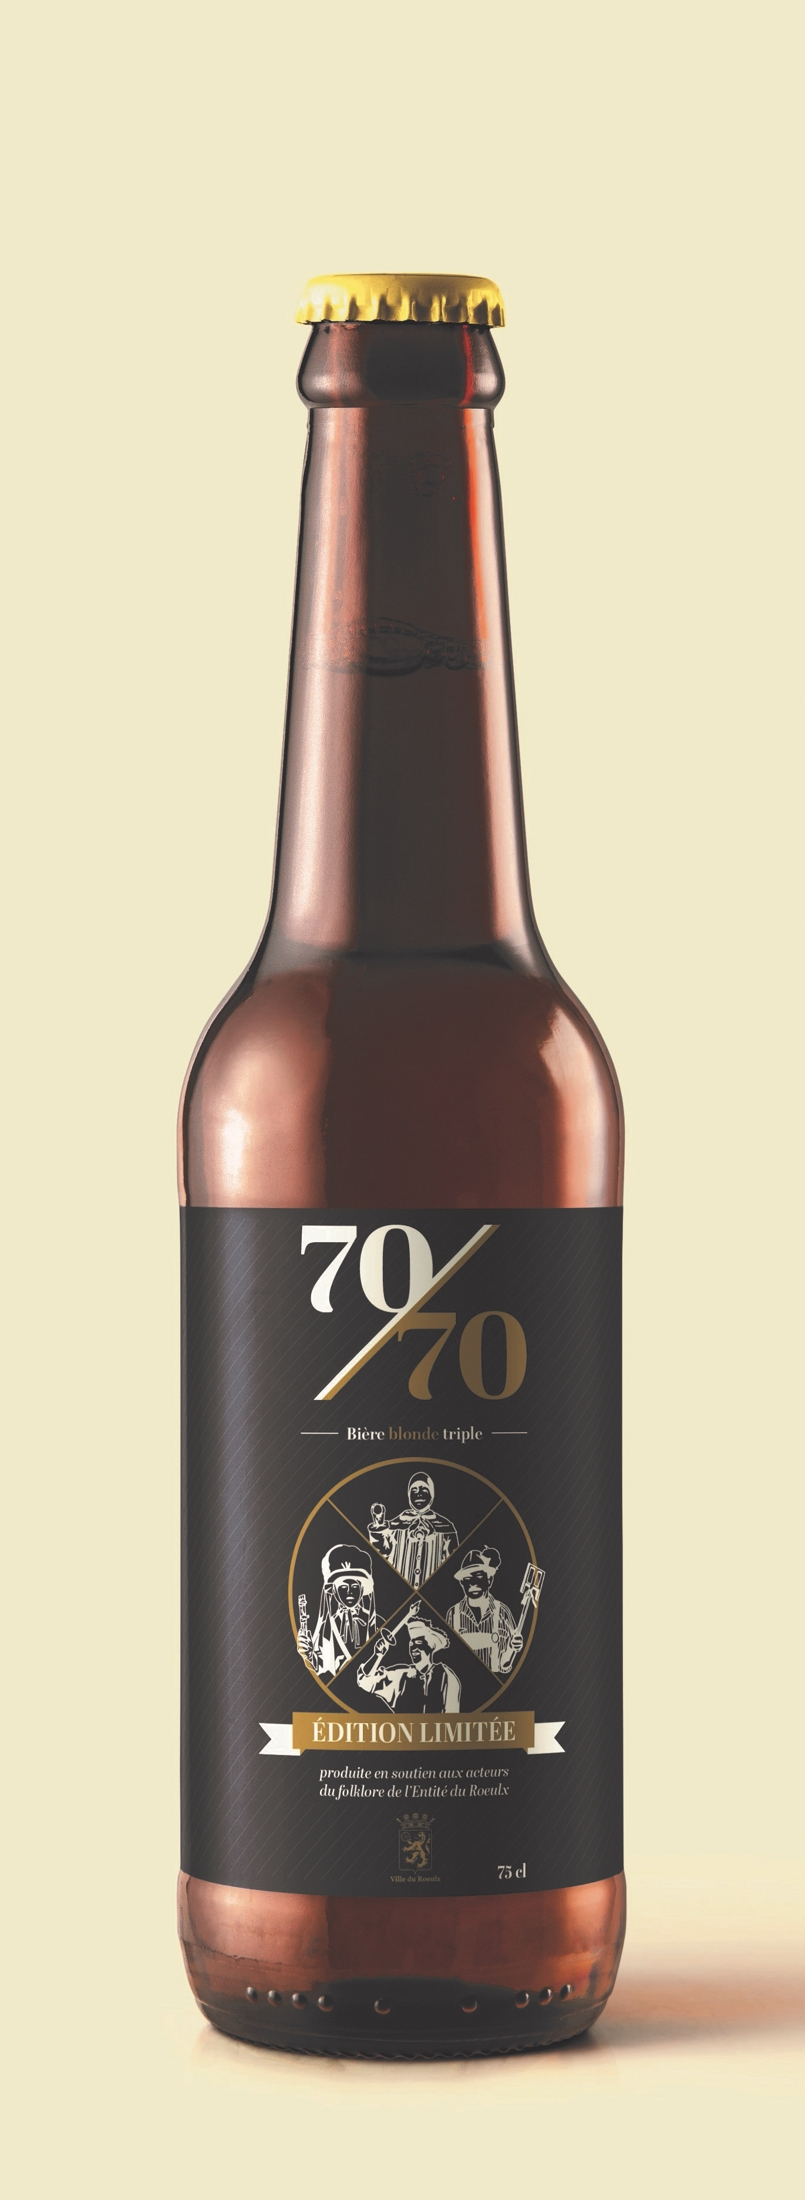 Bouteille biere 7070